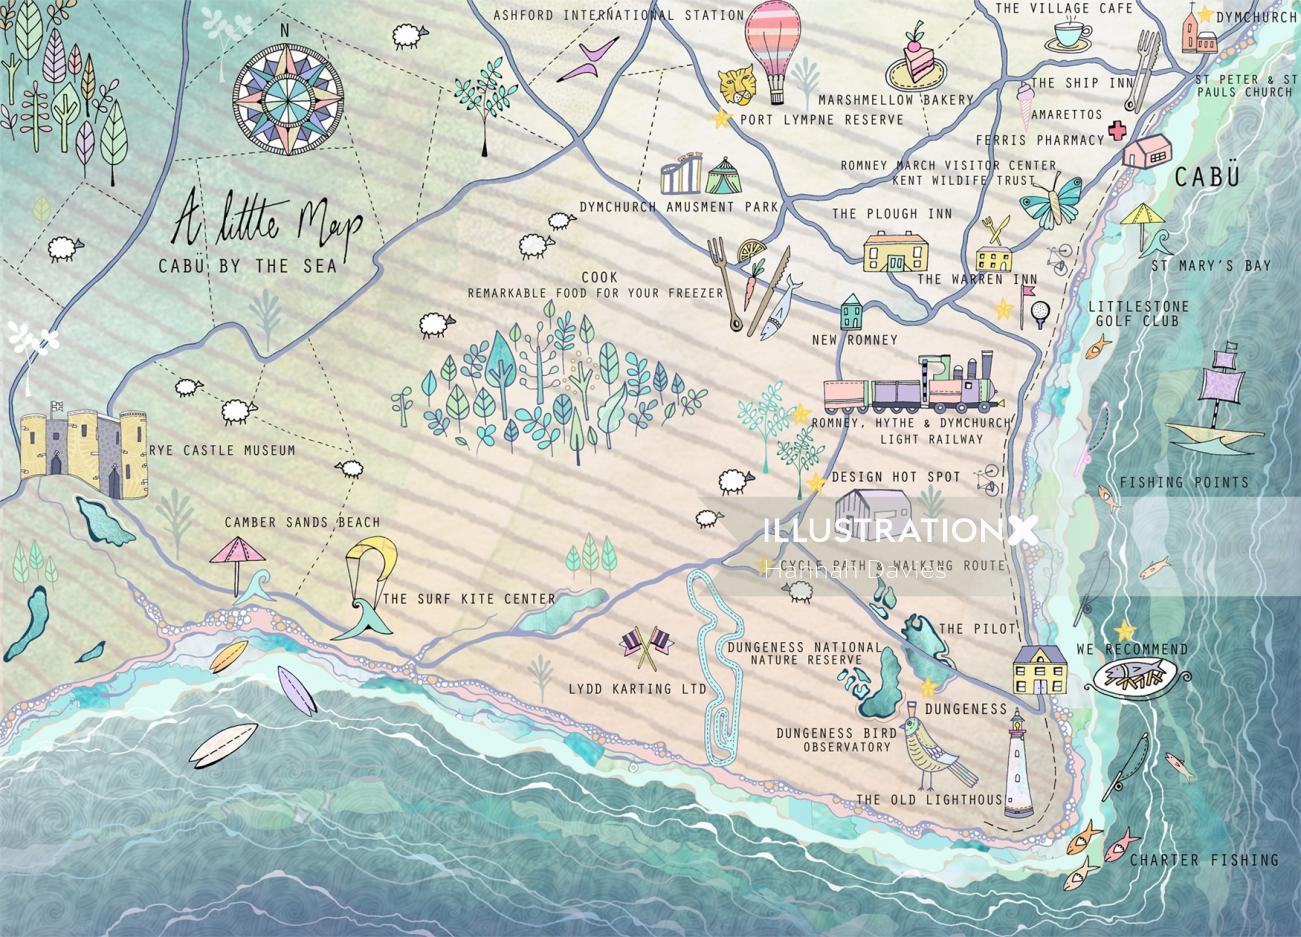 Maps Cabu by the sea